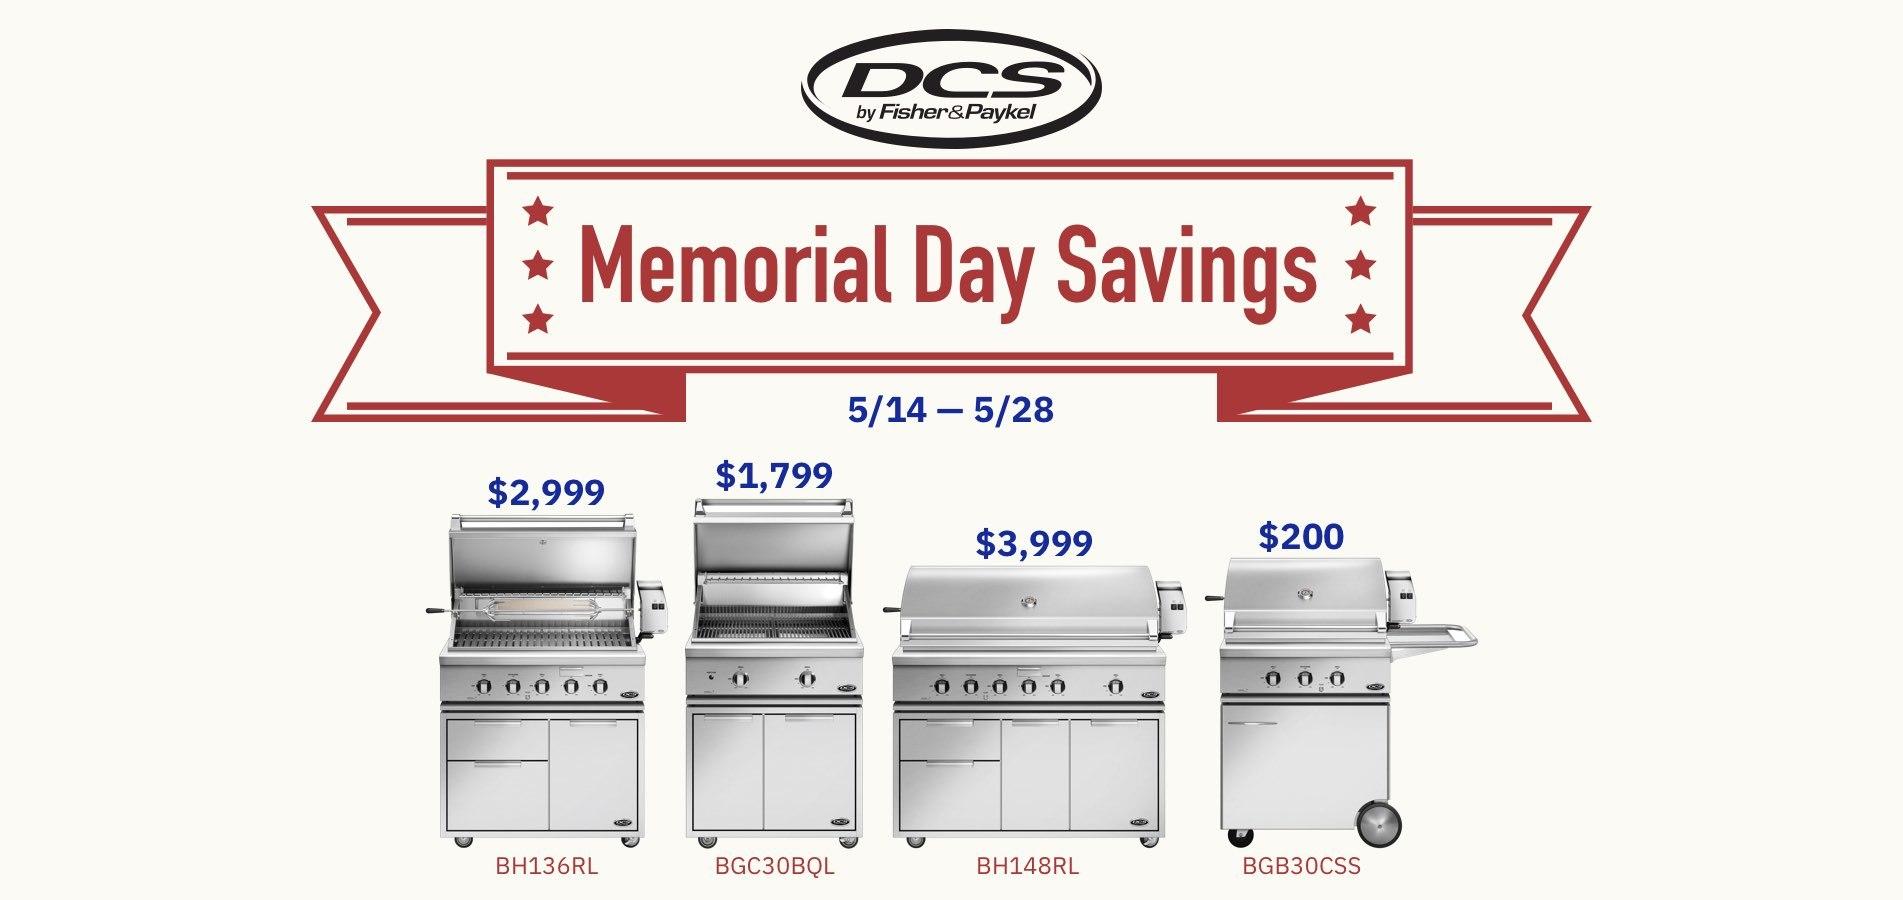 DCS Memorial Day